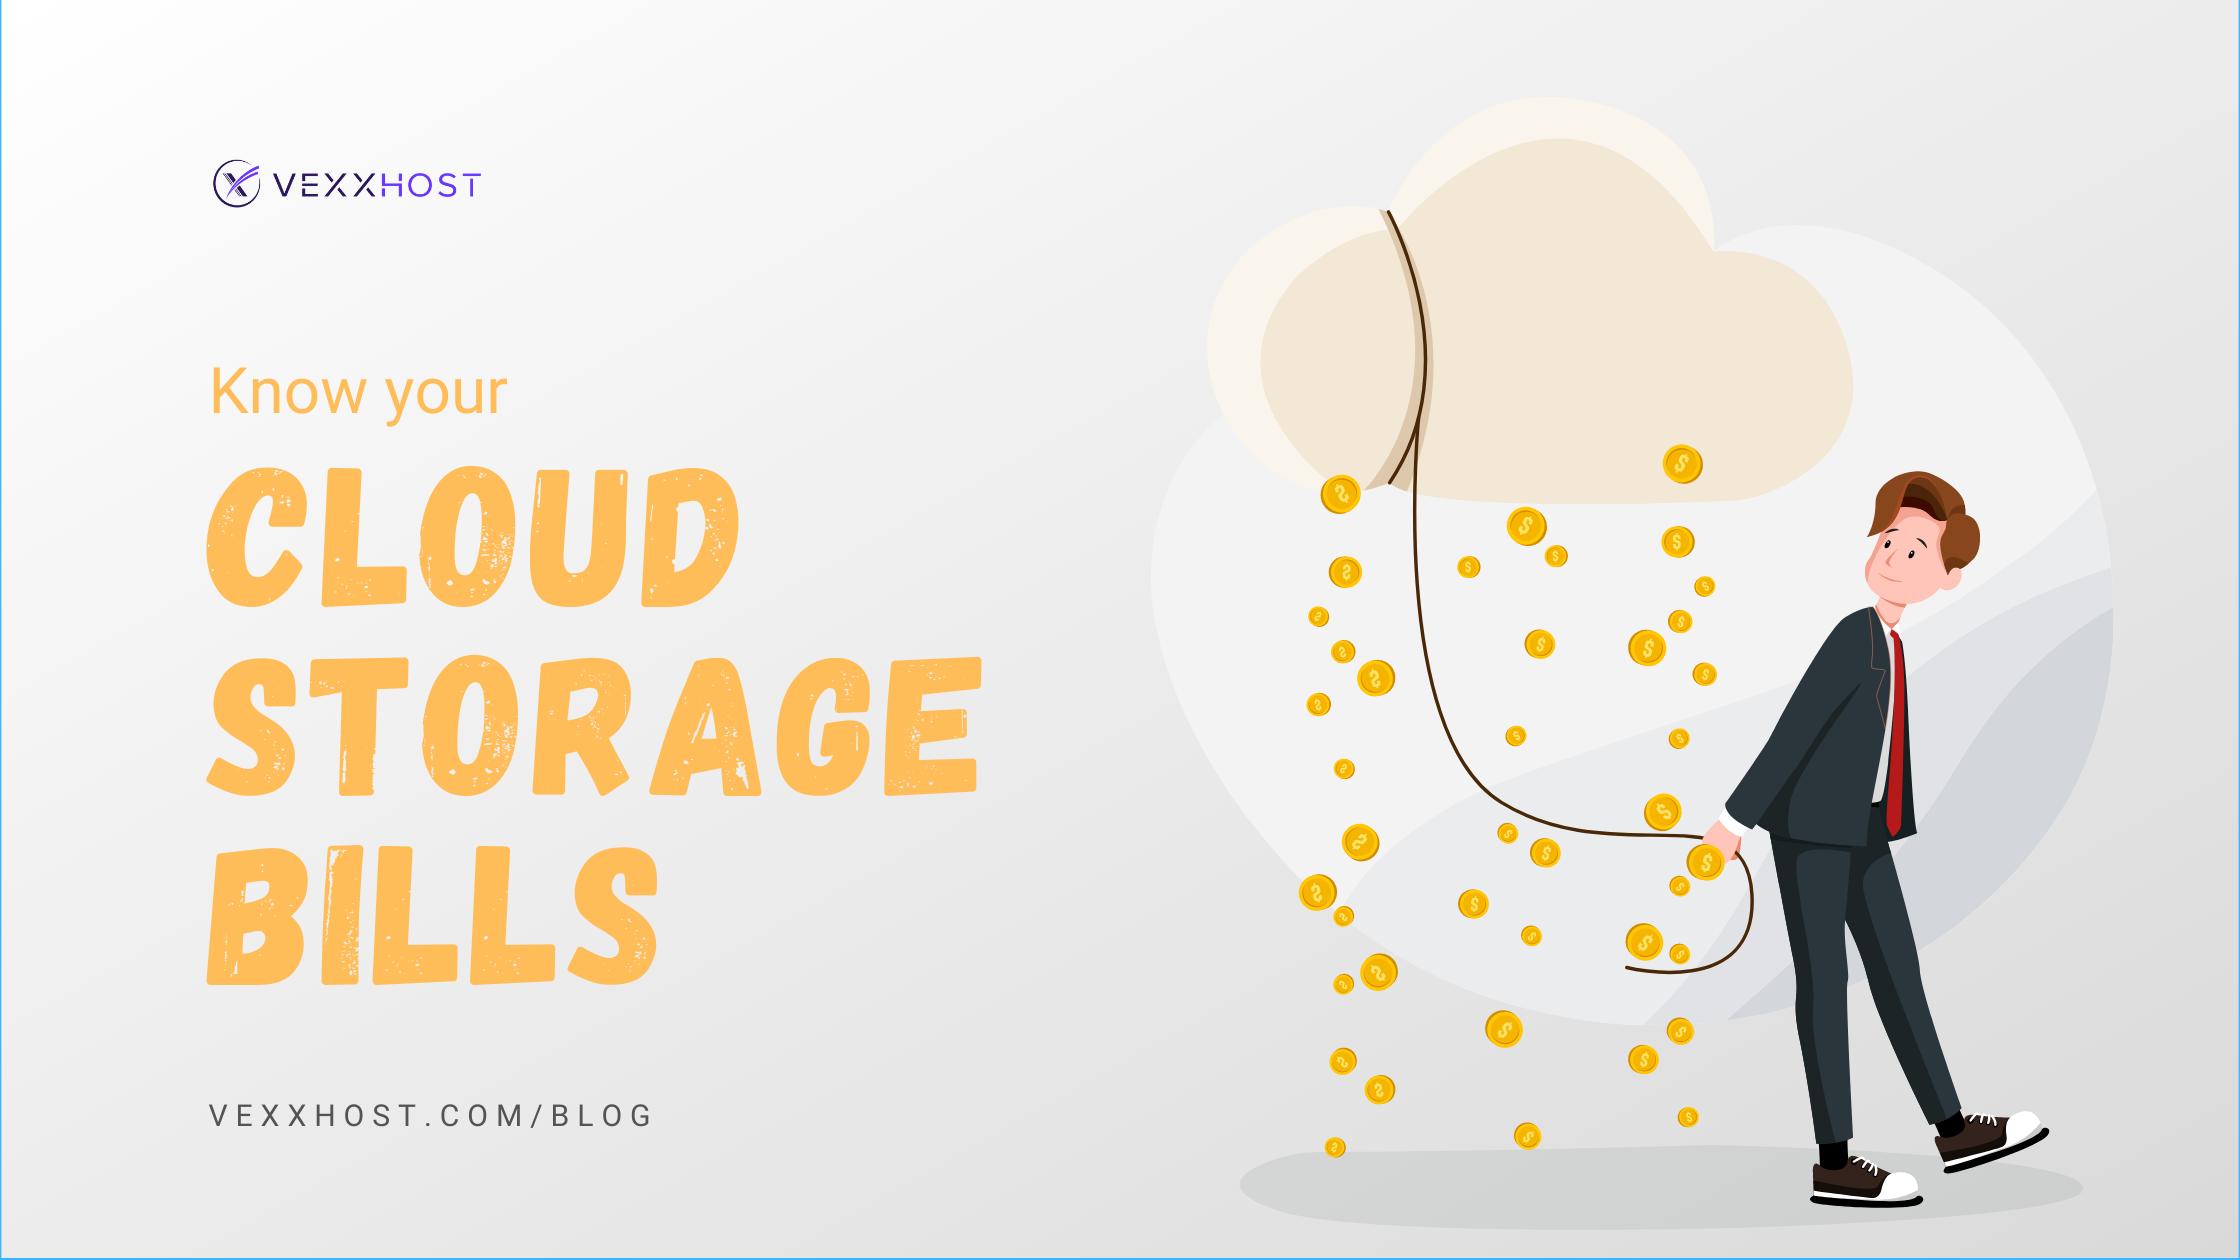 Public Cloud Storage Bills